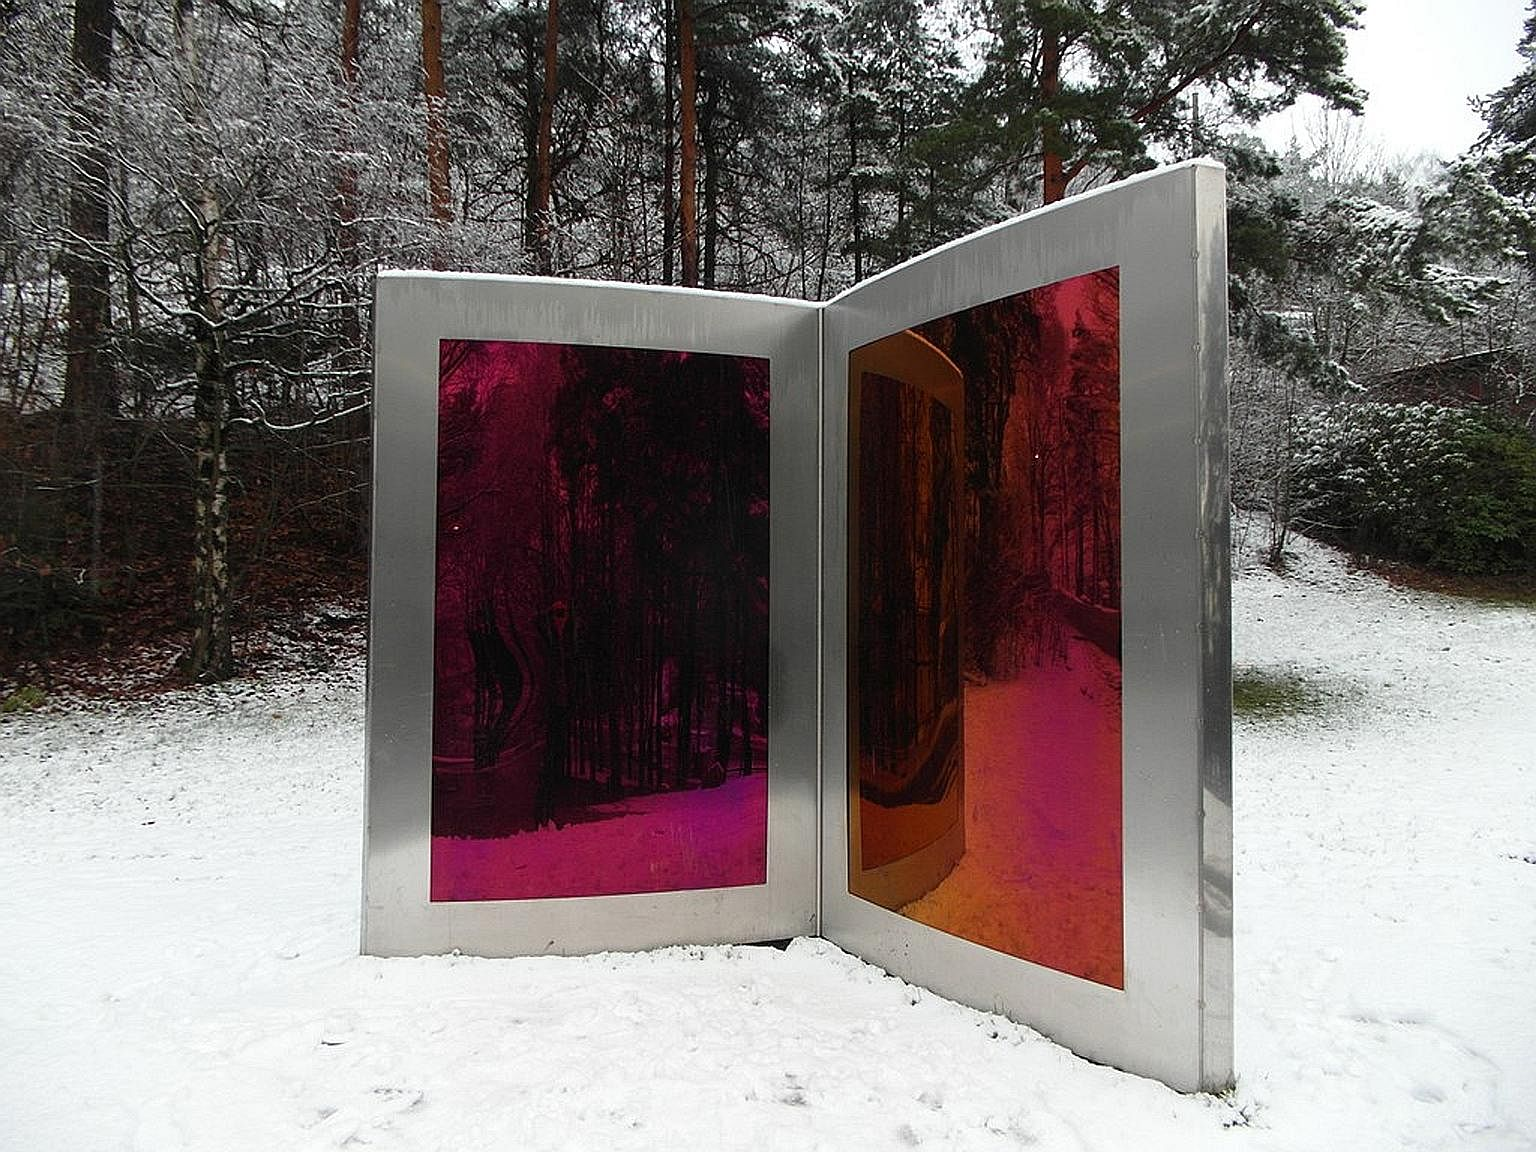 Ekebergparken Sculpture Park, Oslo, Norway